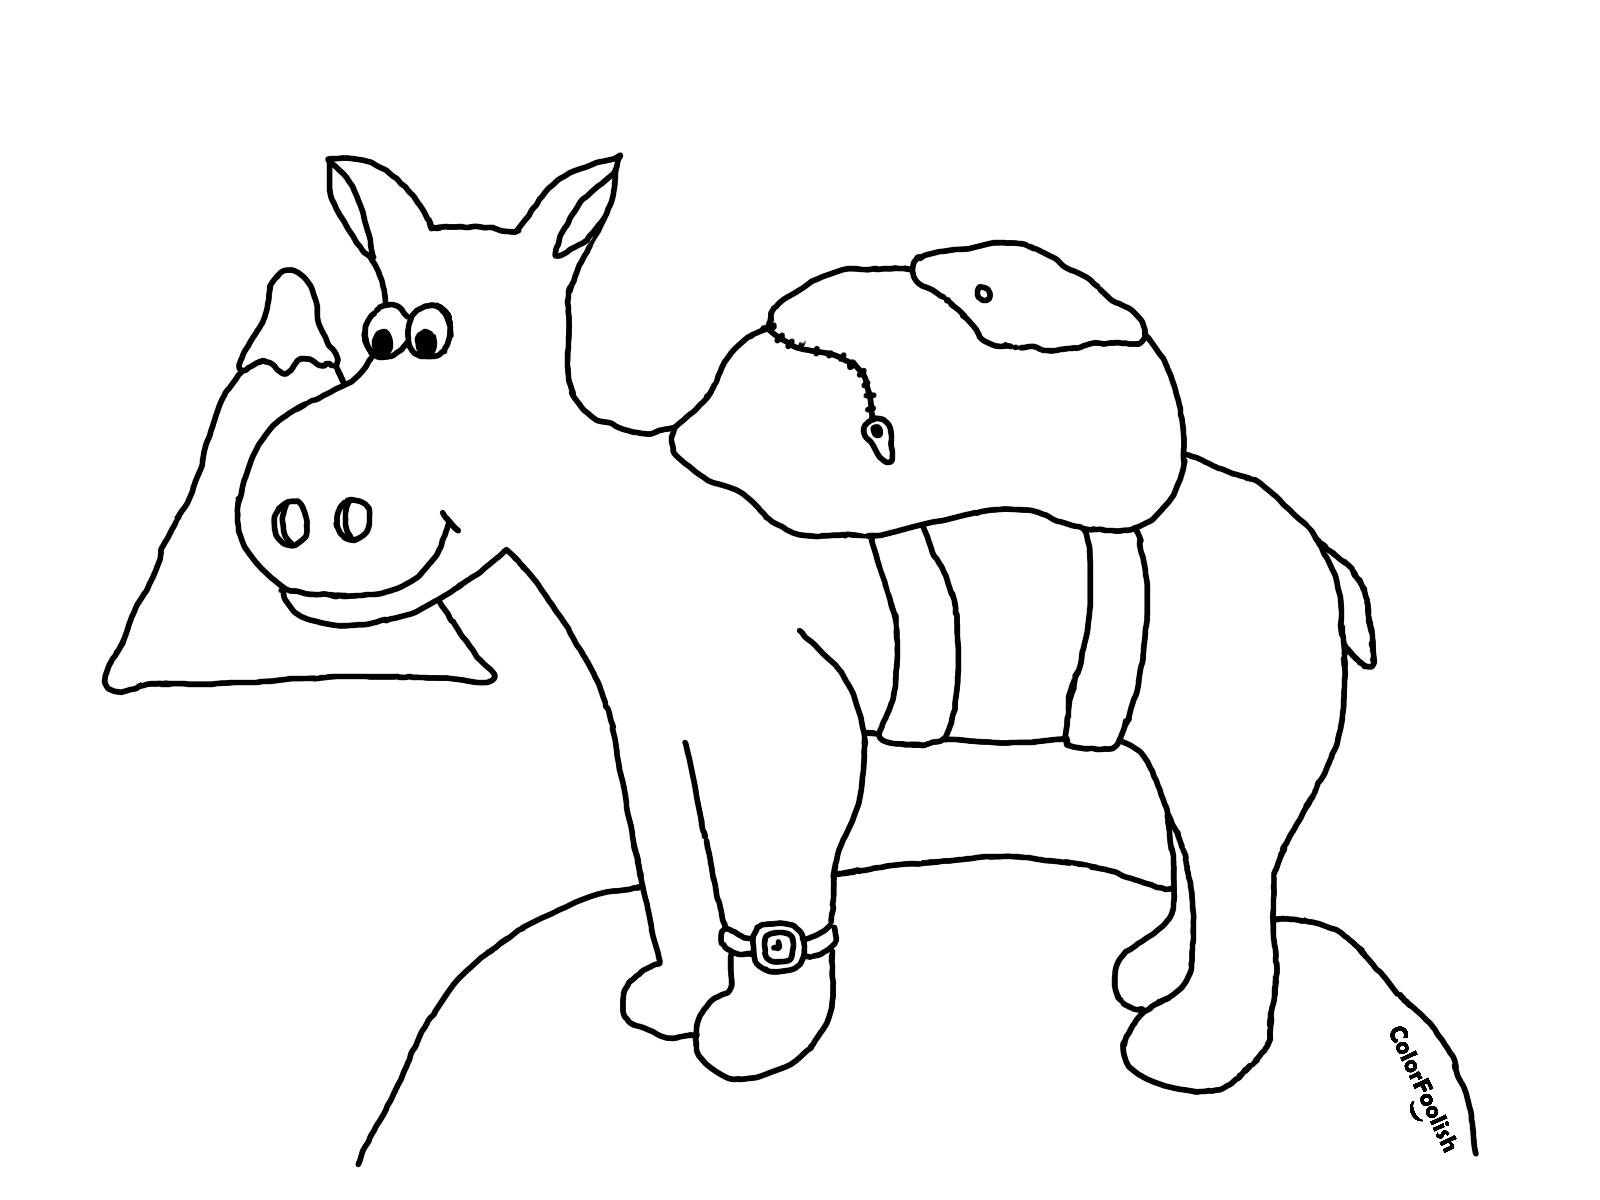 Halaman Mewarnai Keledai Di Atas Gunung ColorFoolish